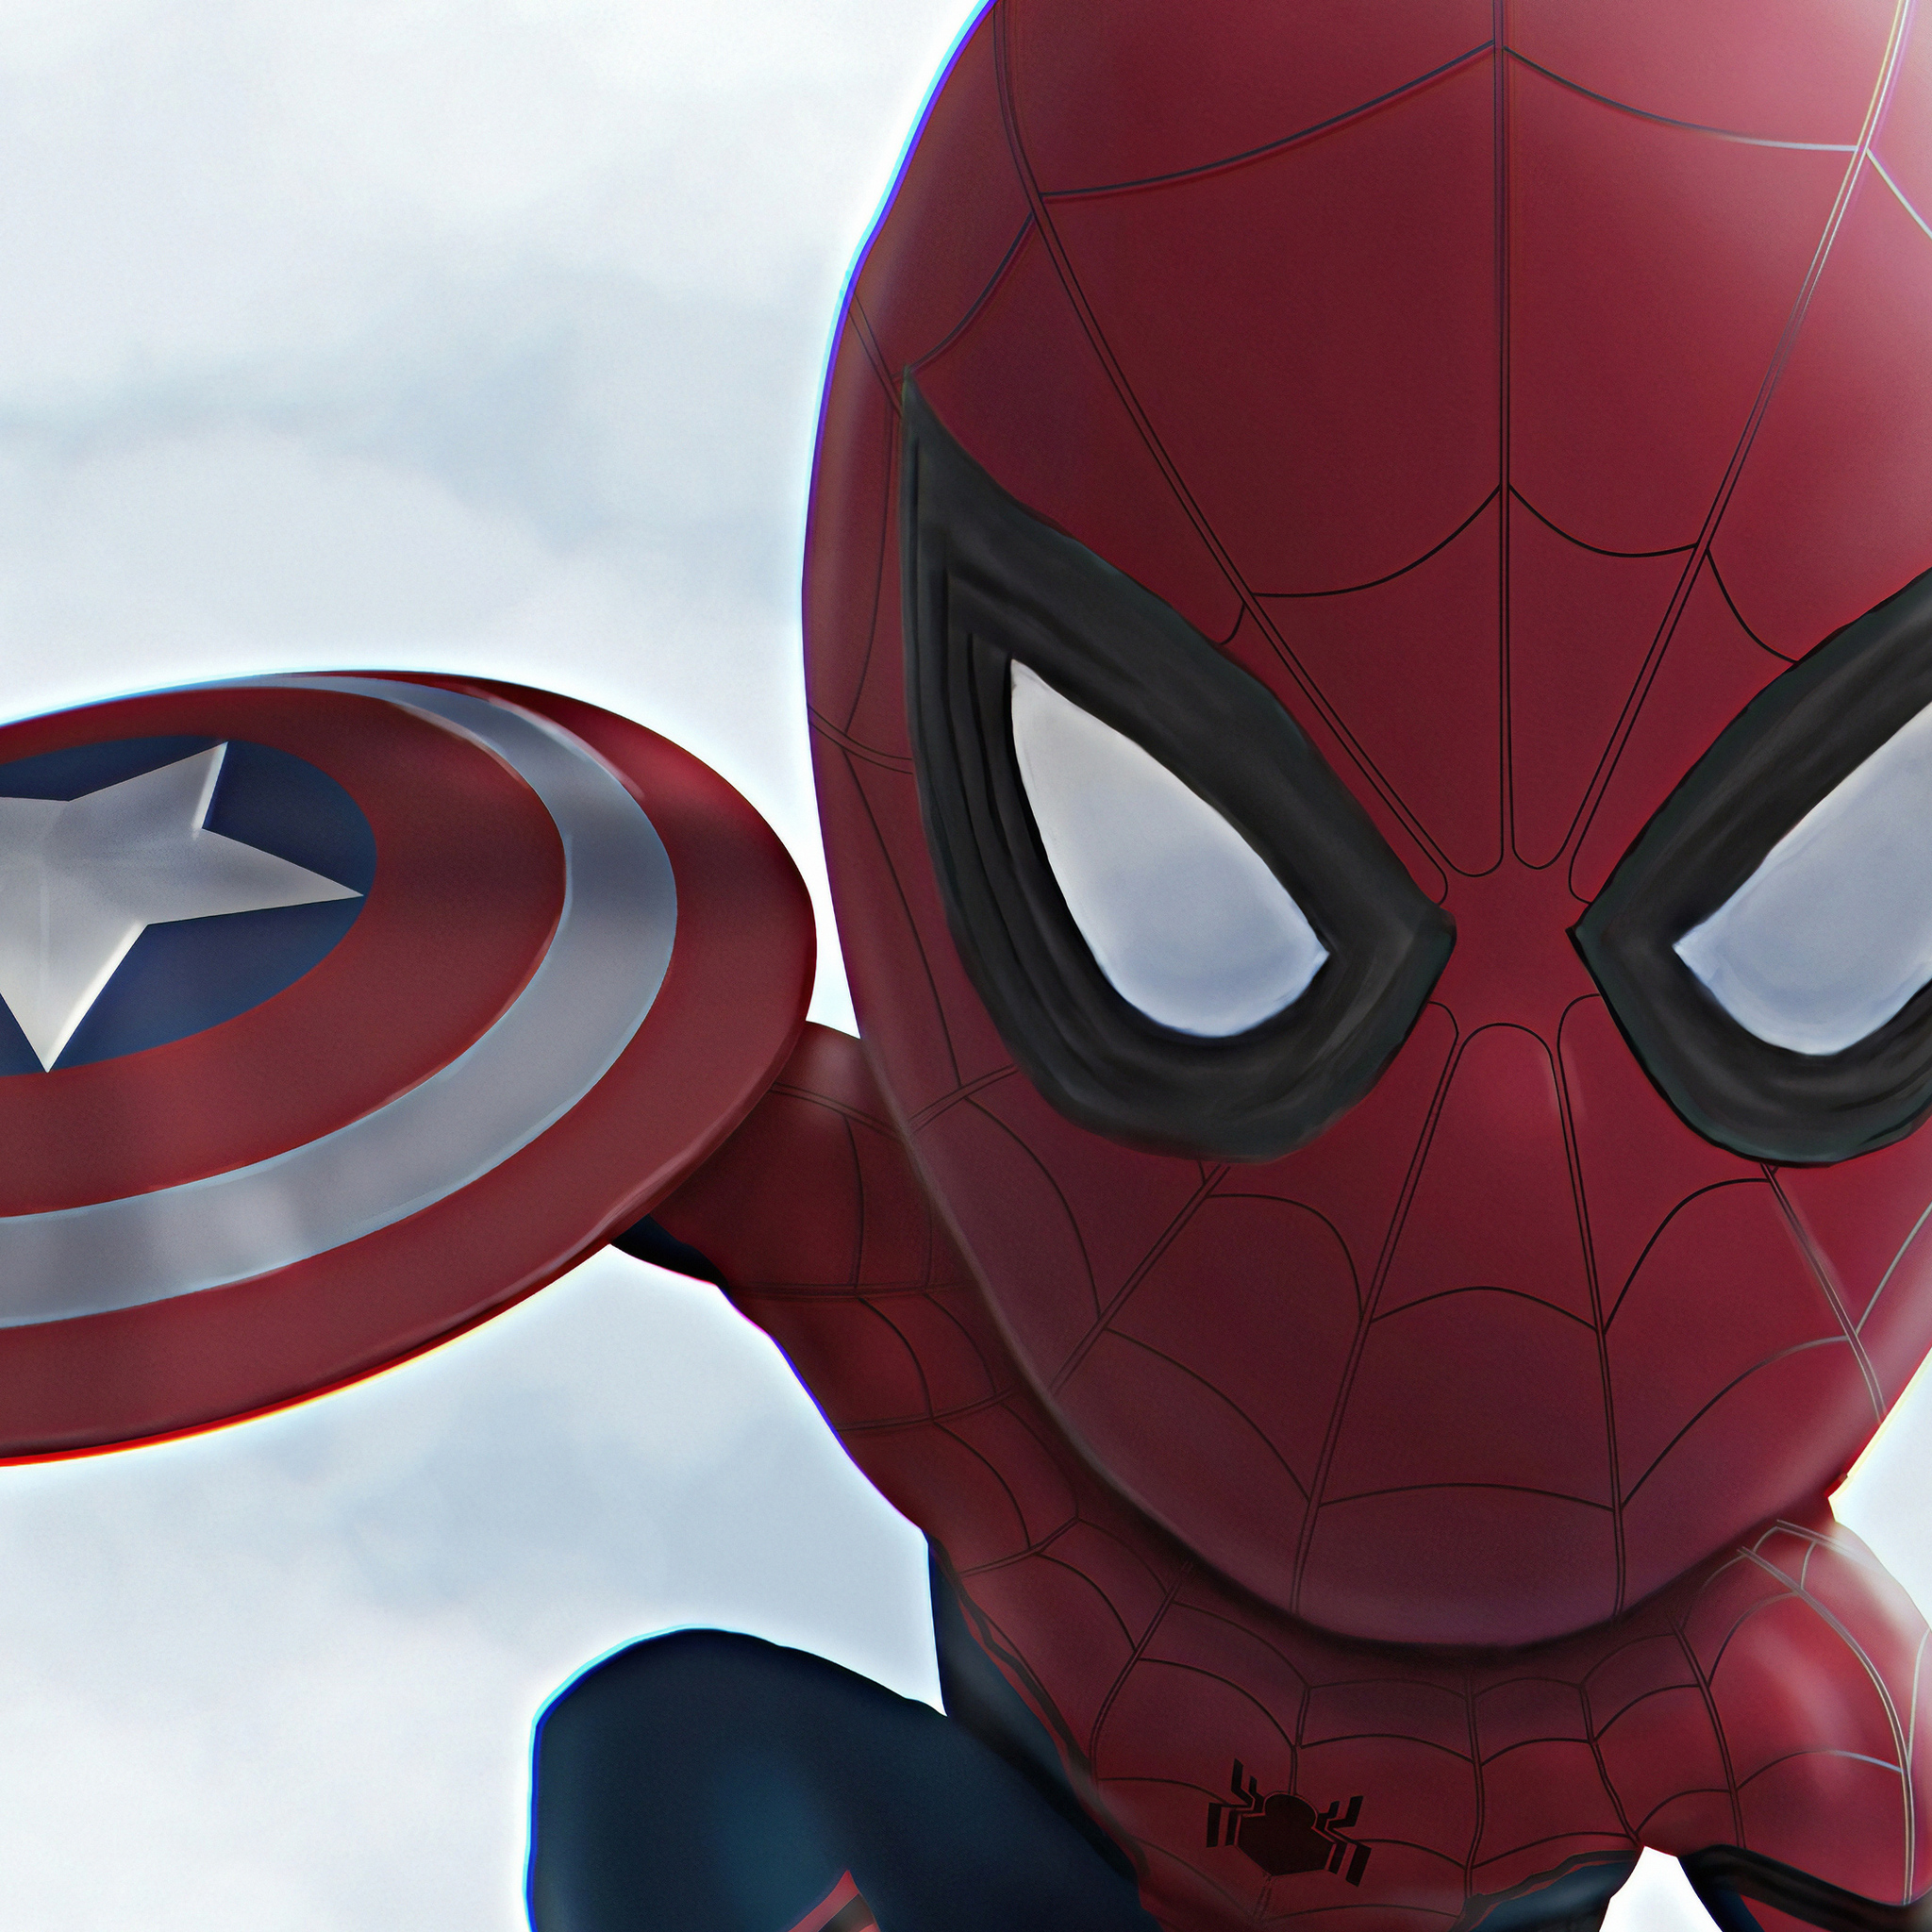 little-spiderman-with-shield-p3.jpg